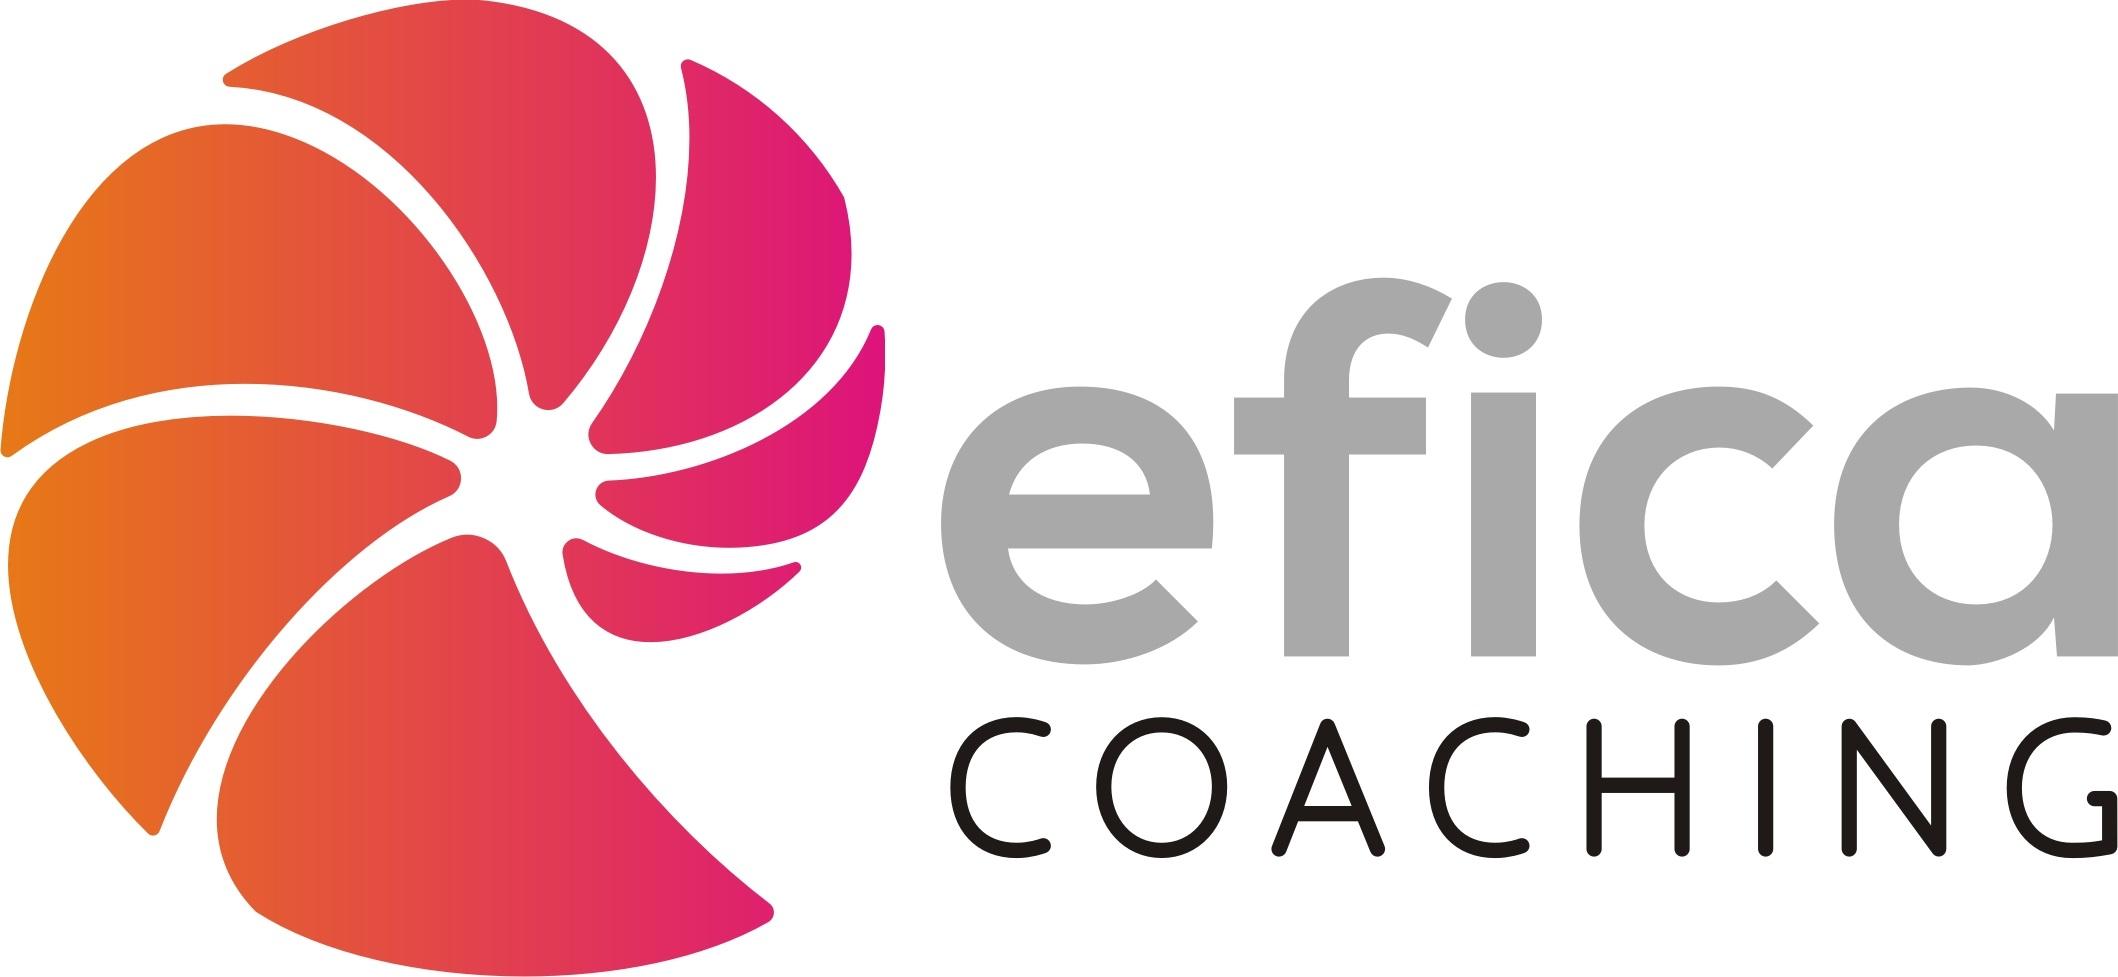 Efica Coach